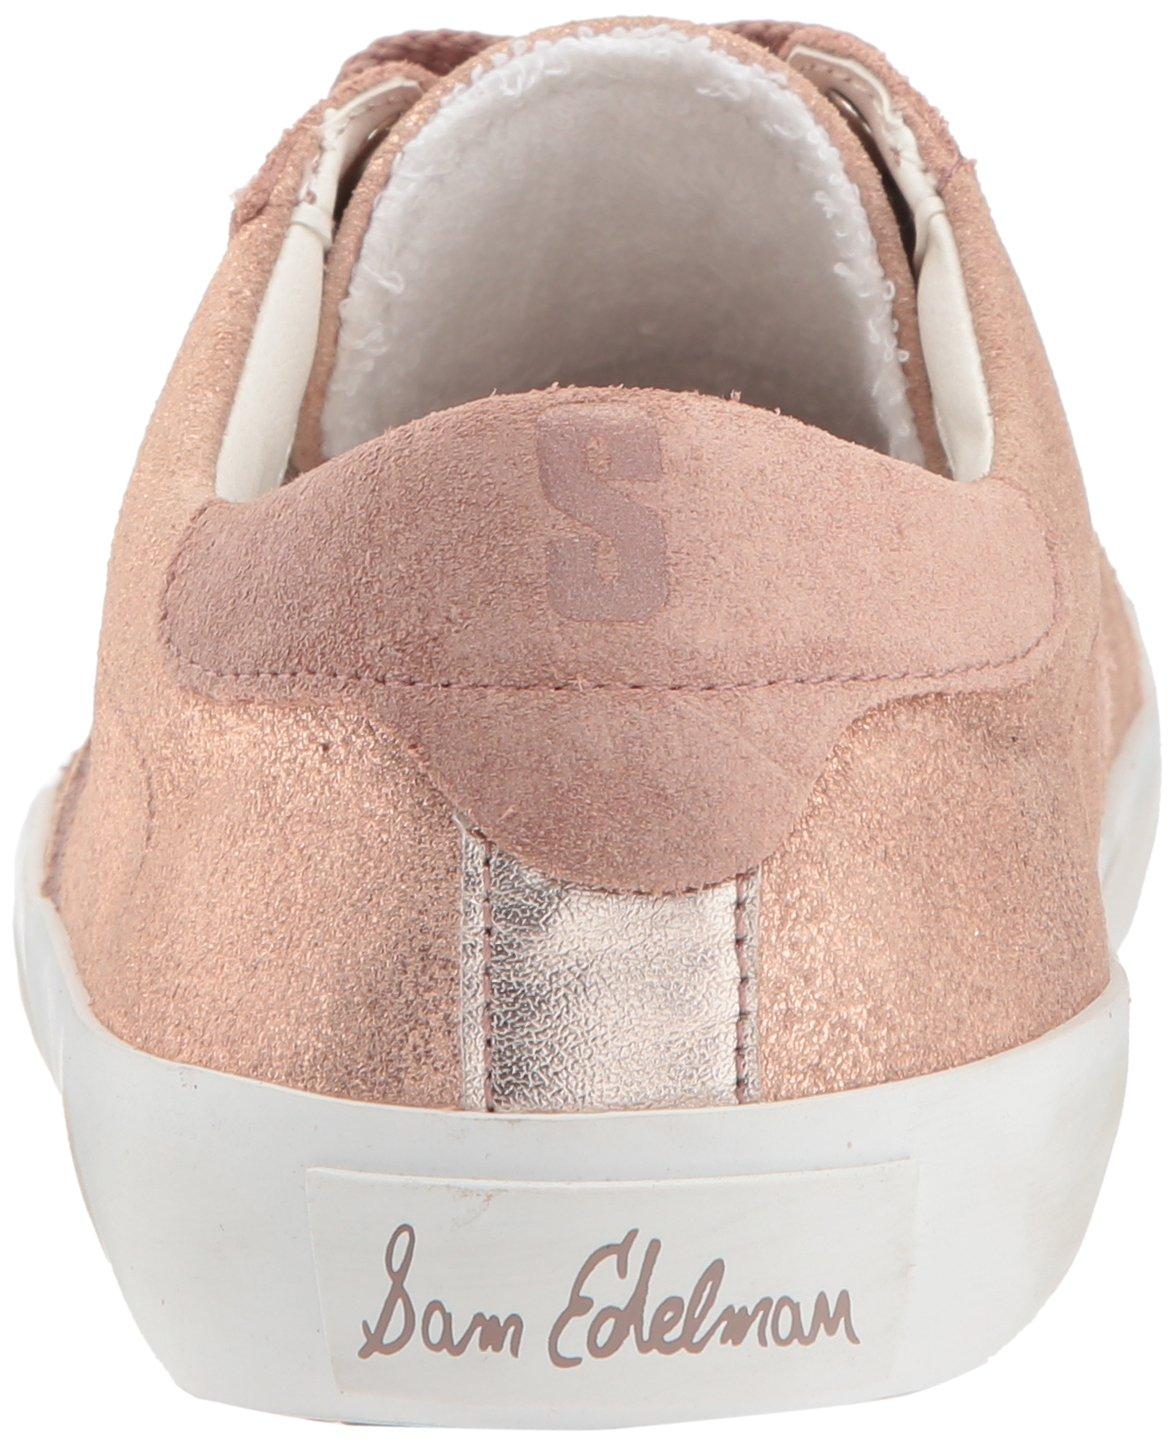 Sam Edelman Women's Baylee Sneaker B072R7MLGQ 8 B(M) US Blush/Dusty Rose